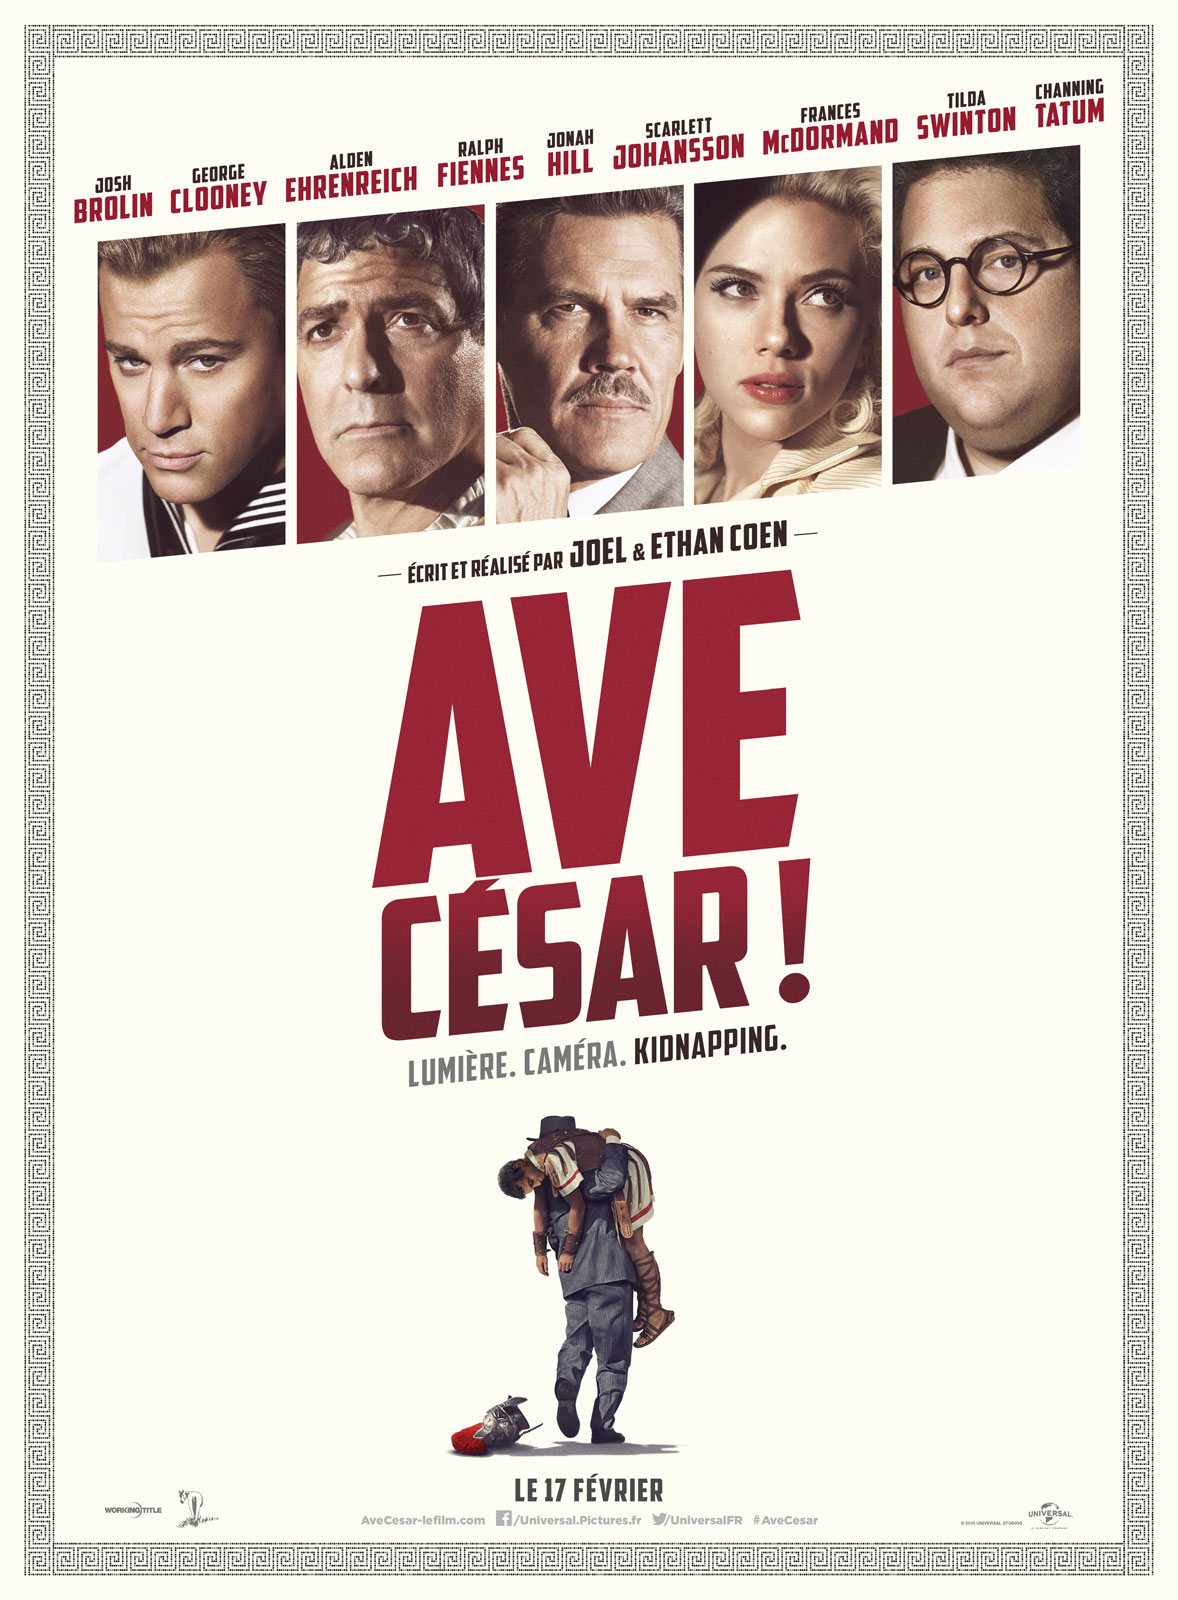 ave_cesar_affiche